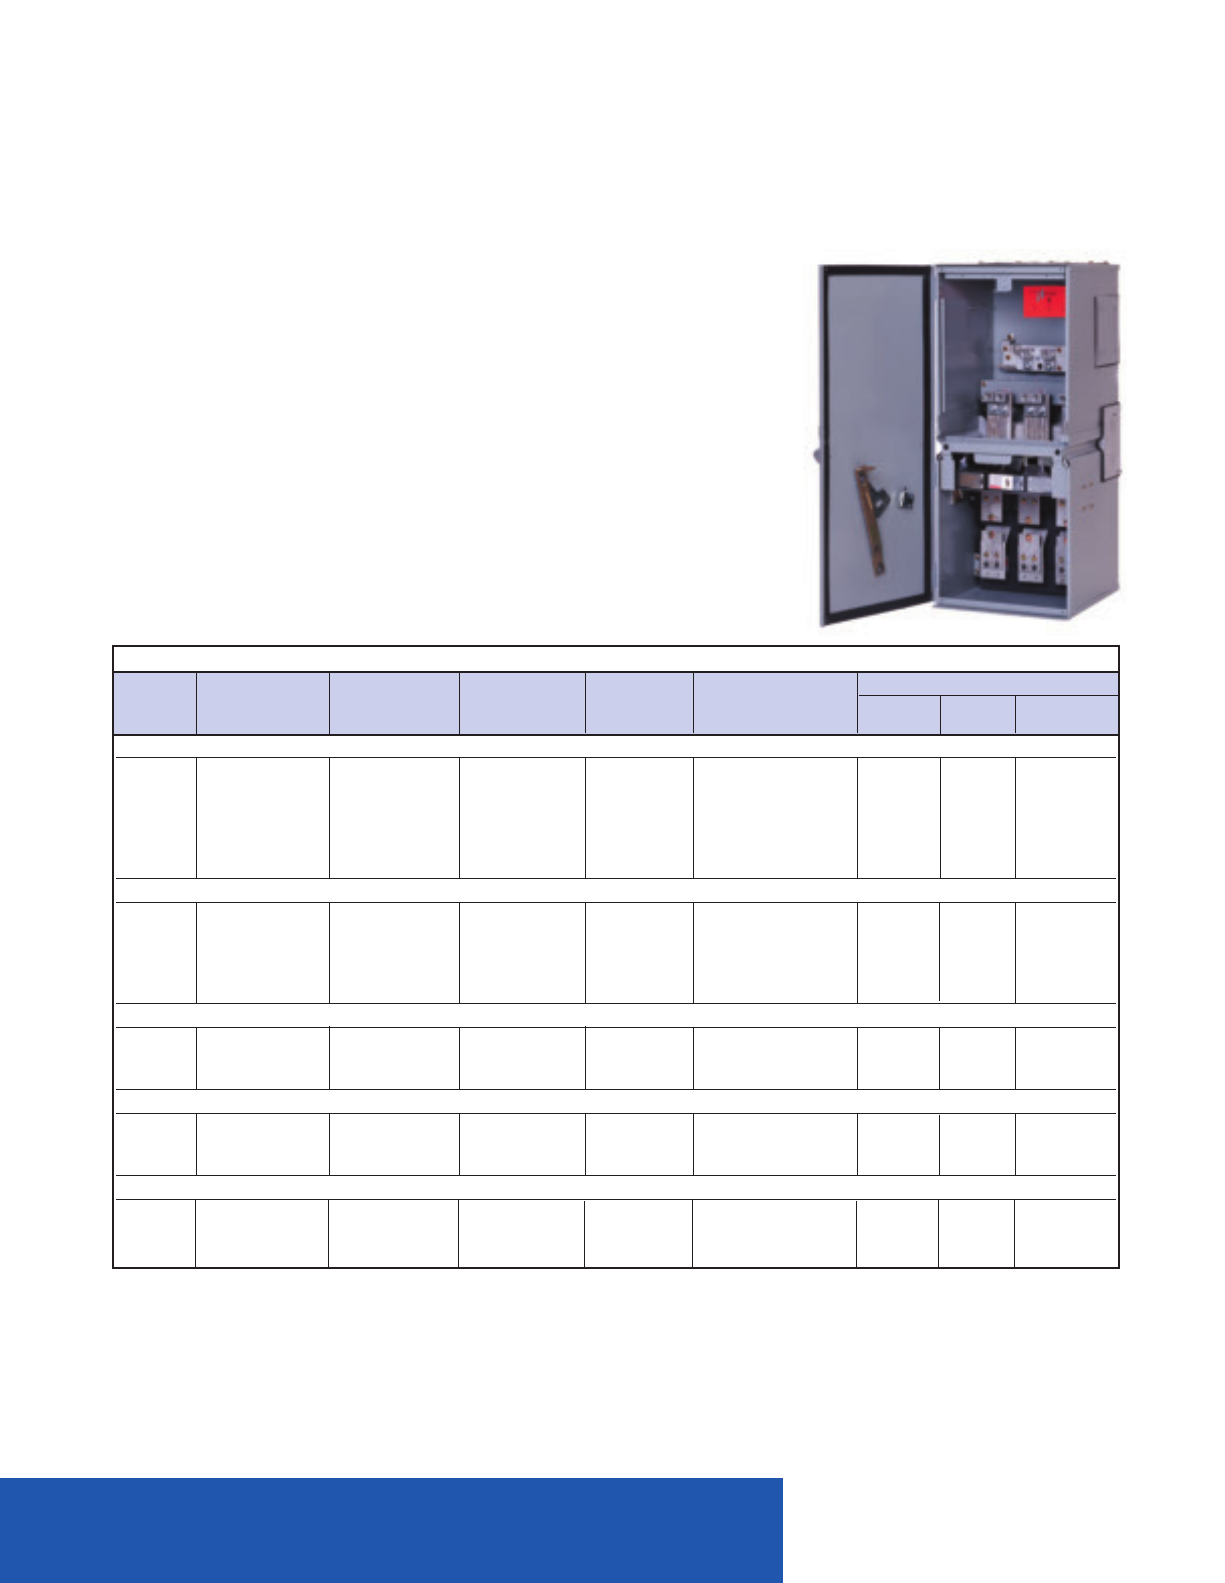 New Siemens Meter Main MM0406ML1200S 200A 3R Enclosure 120//240 V 1 phase